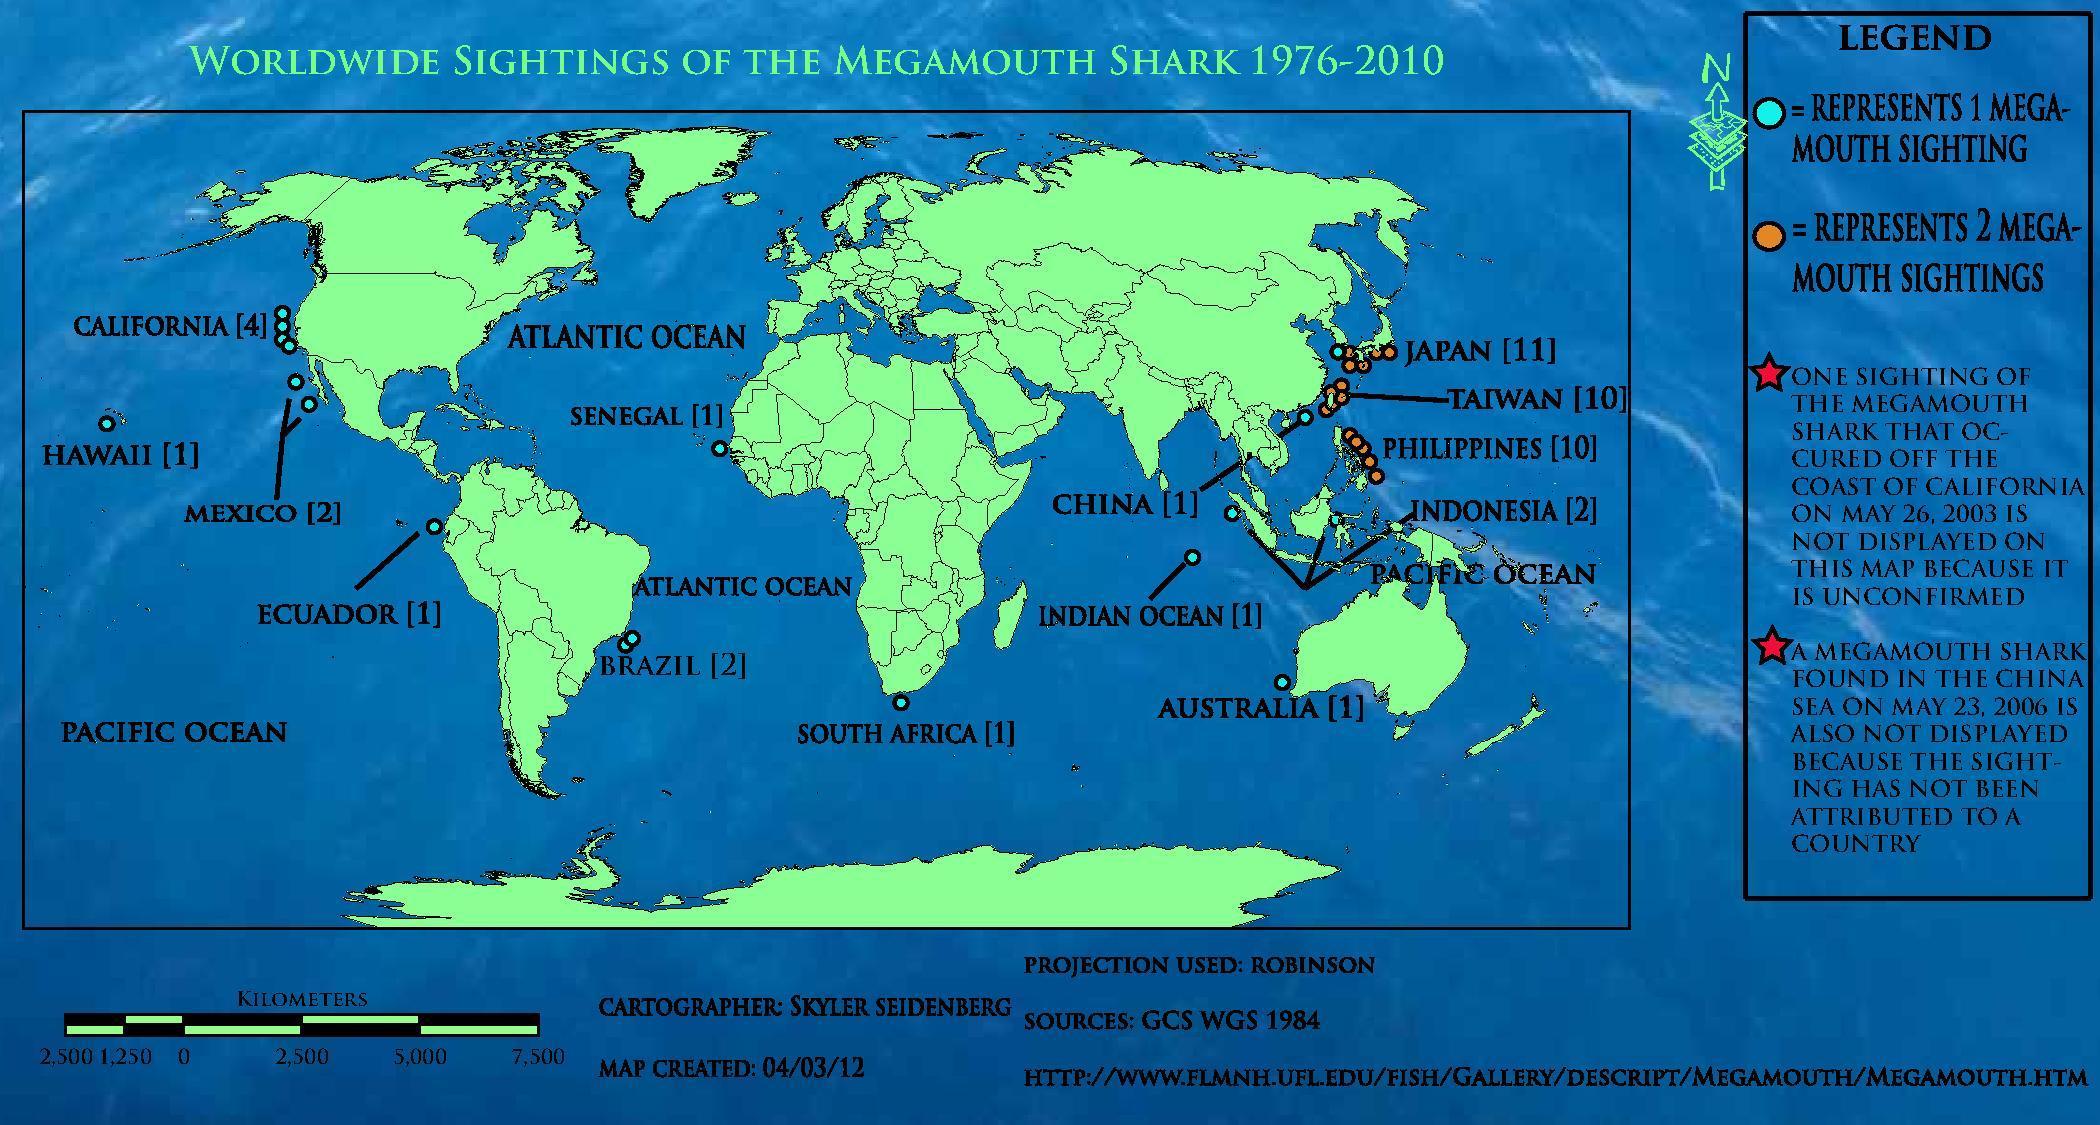 Fileworldwide megamouth sightingspdf wikimedia commons fileworldwide megamouth sightingspdf gumiabroncs Image collections